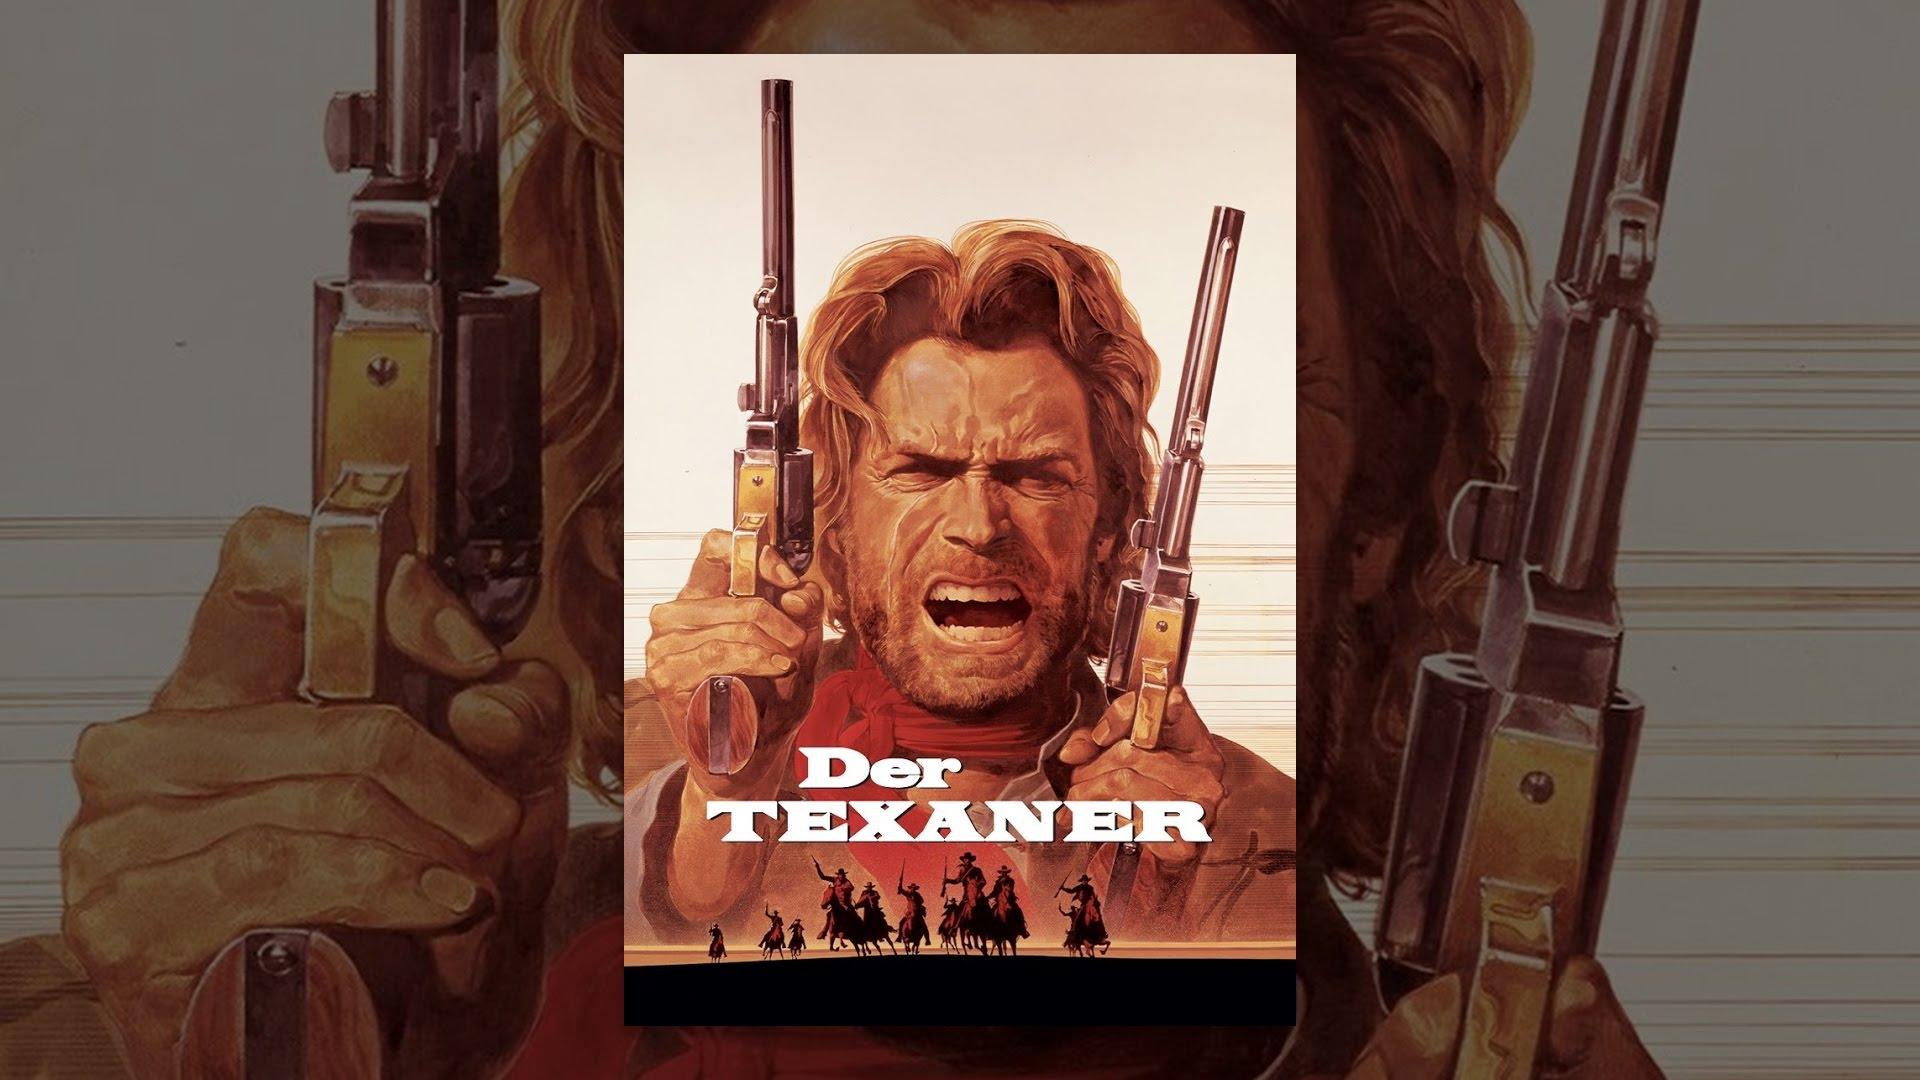 Texaner